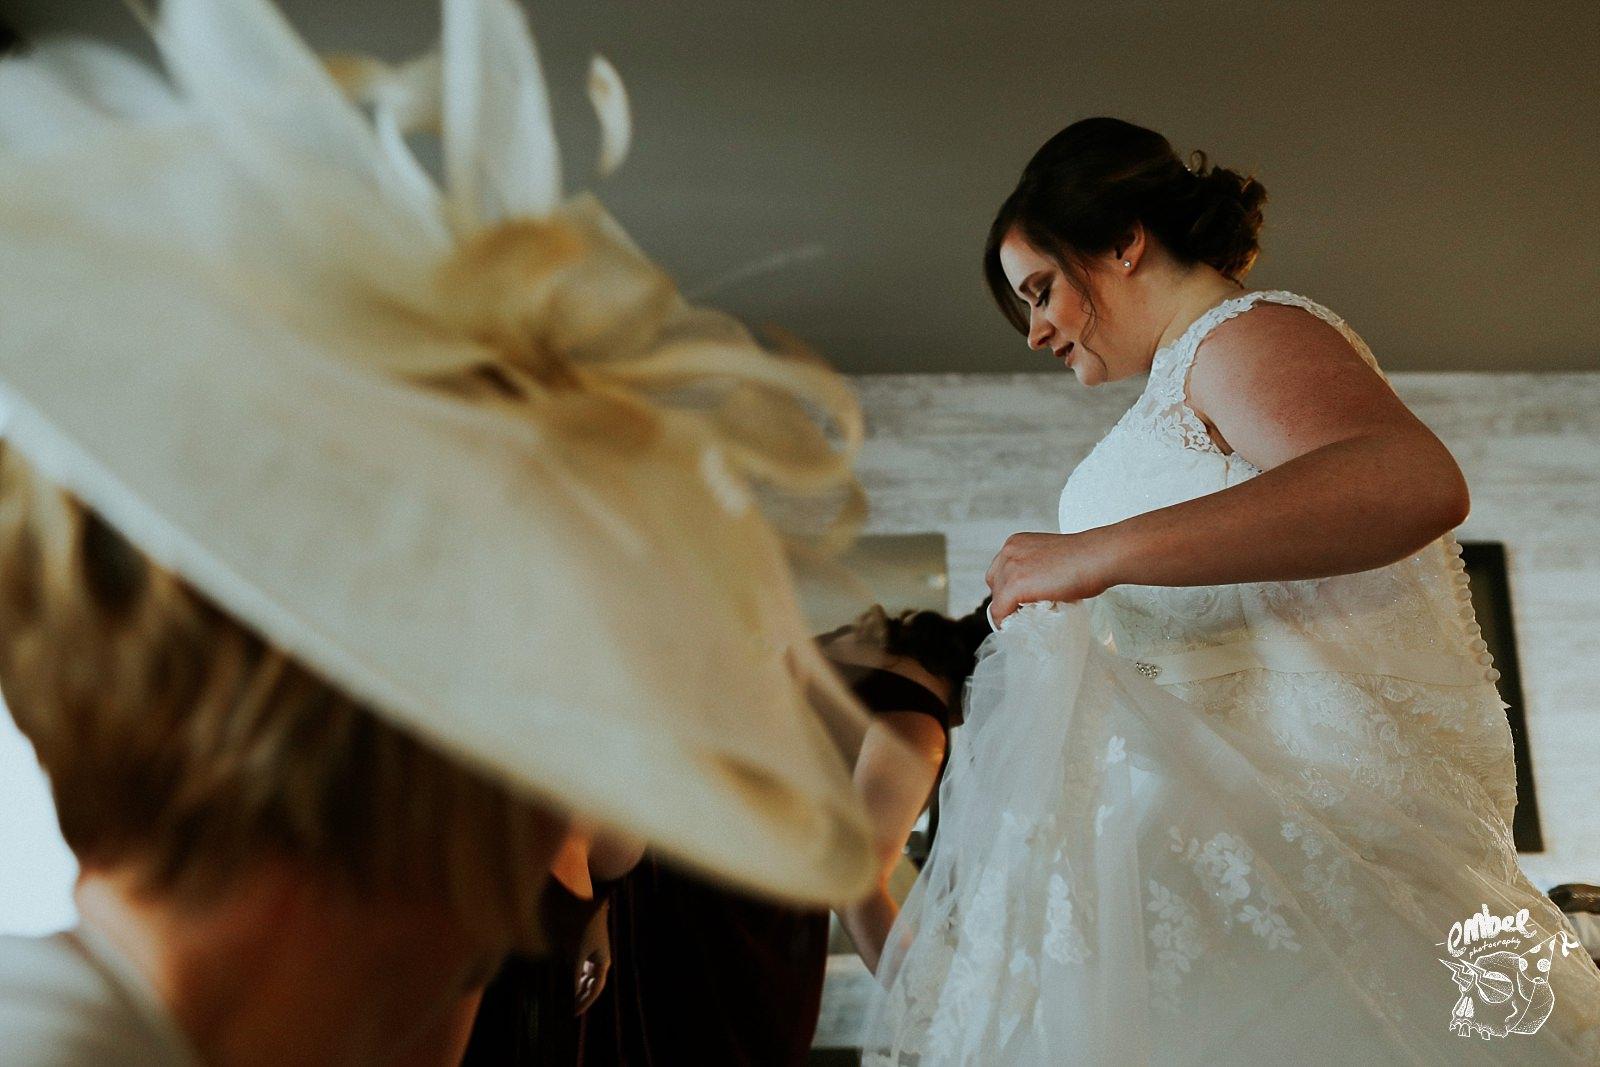 bride lifting her dress up